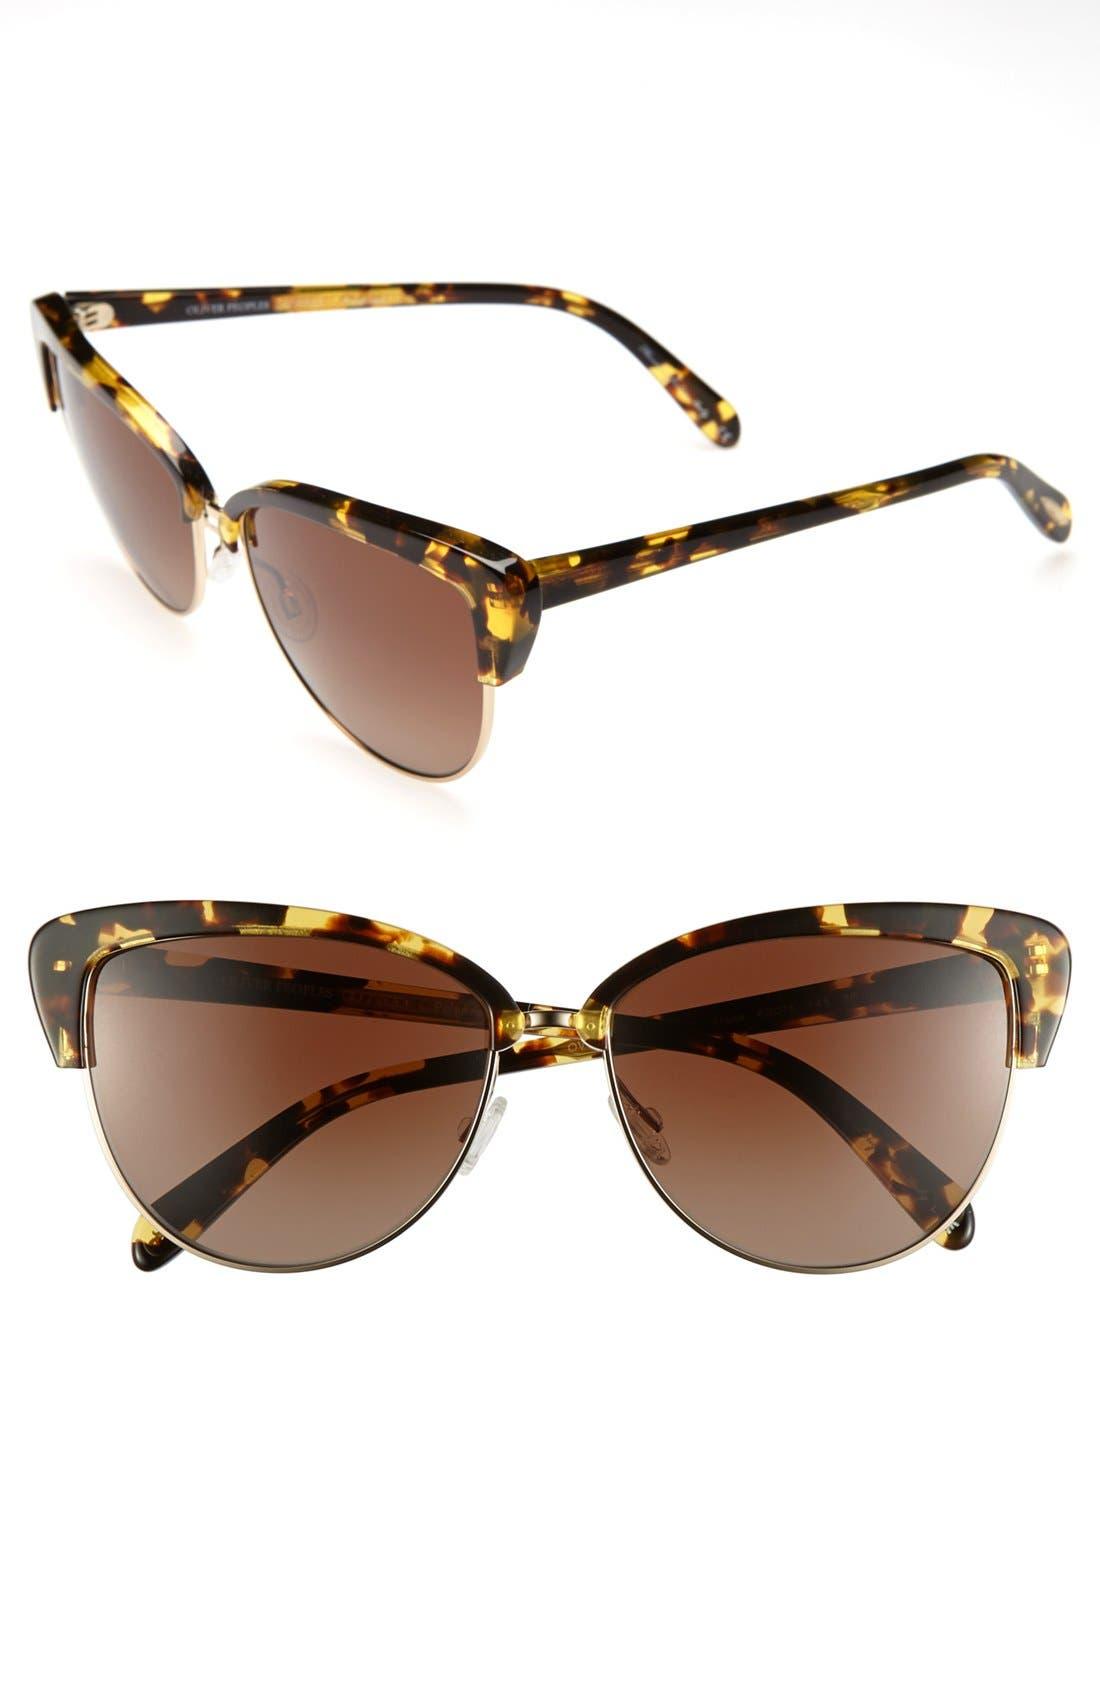 Alternate Image 1 Selected - Oliver Peoples 'Alisha' 60mm Polarized Sunglasses